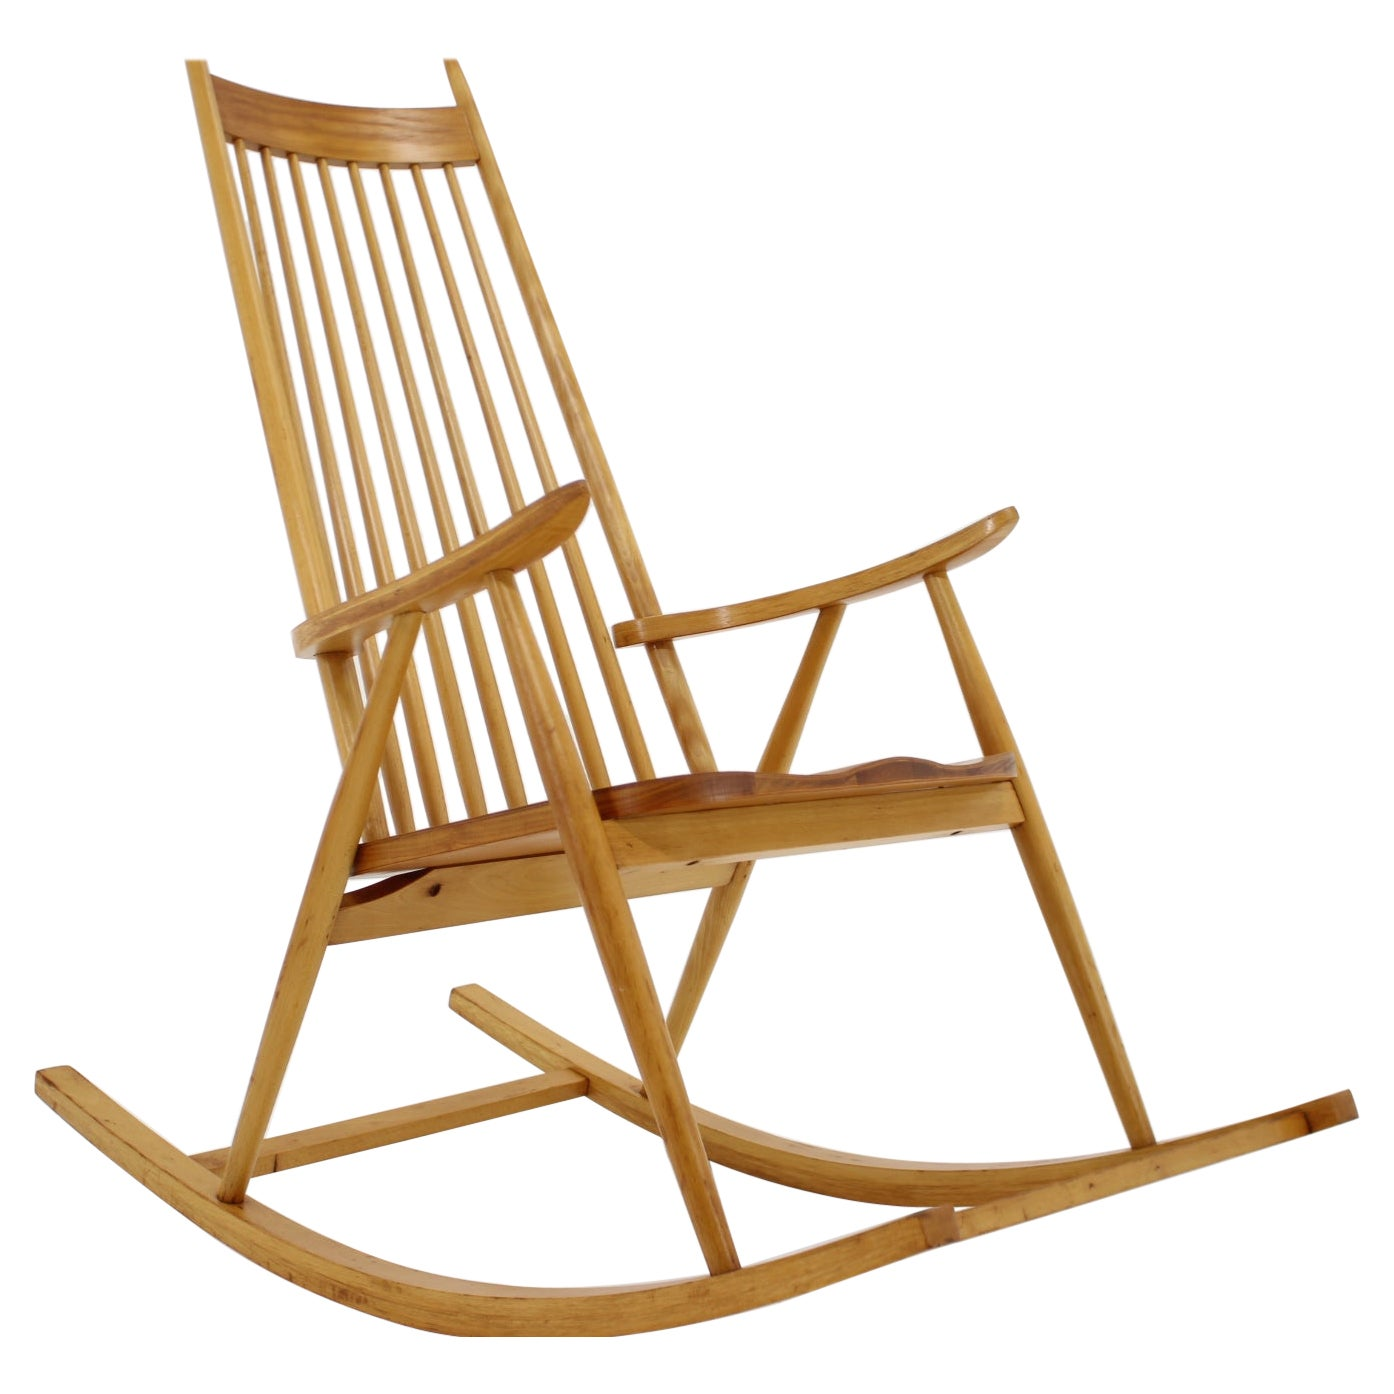 1960s Midcentury Wooden Rocking Chair, Czechoslovakia